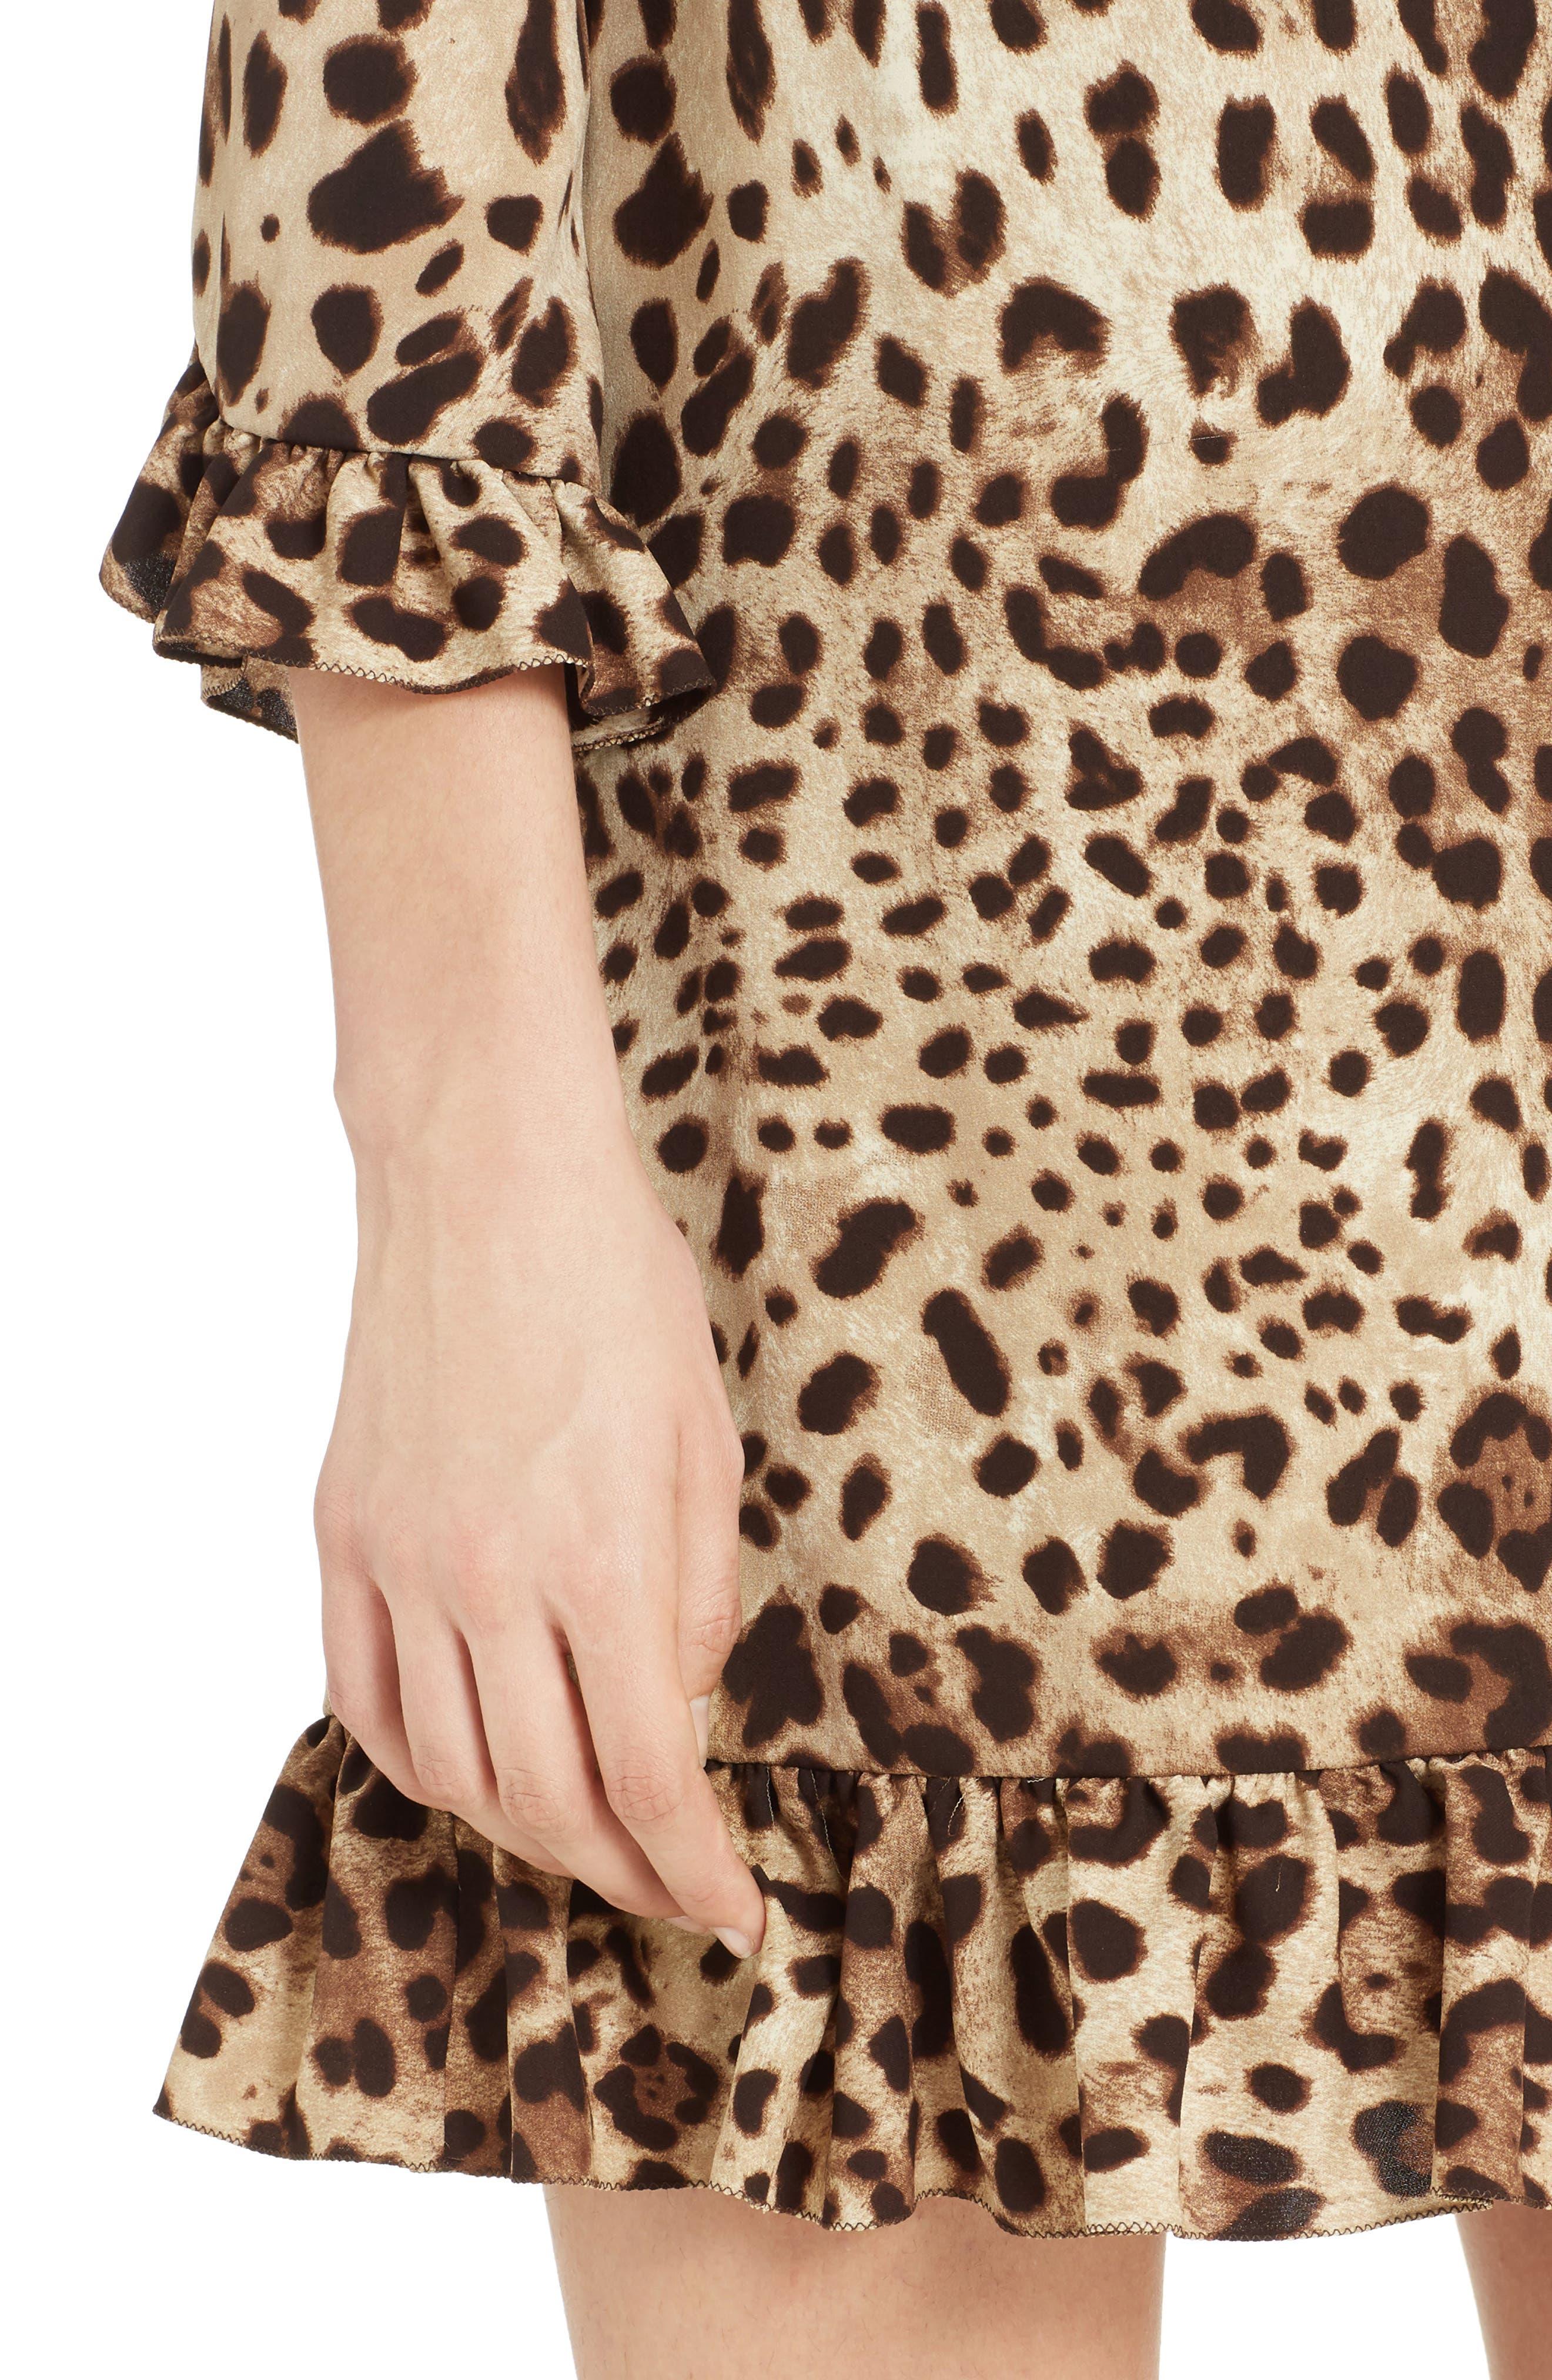 Leopard Print Stretch Silk Dress,                             Alternate thumbnail 4, color,                             200